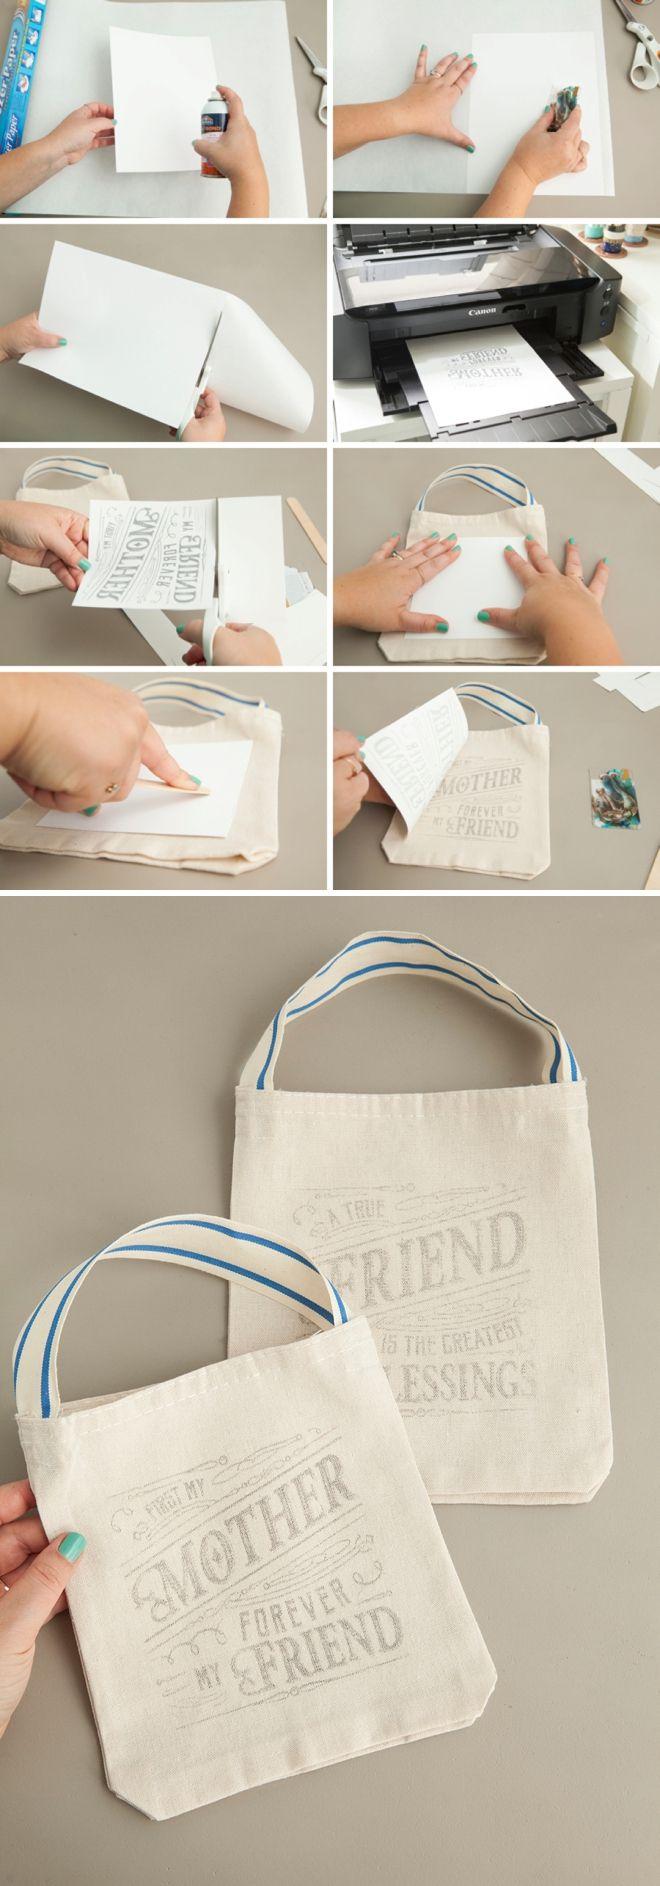 Las 25 mejores ideas sobre plantilla de papel de congelador en pinterest papel de congelador - Crazy uses for the freezer ...